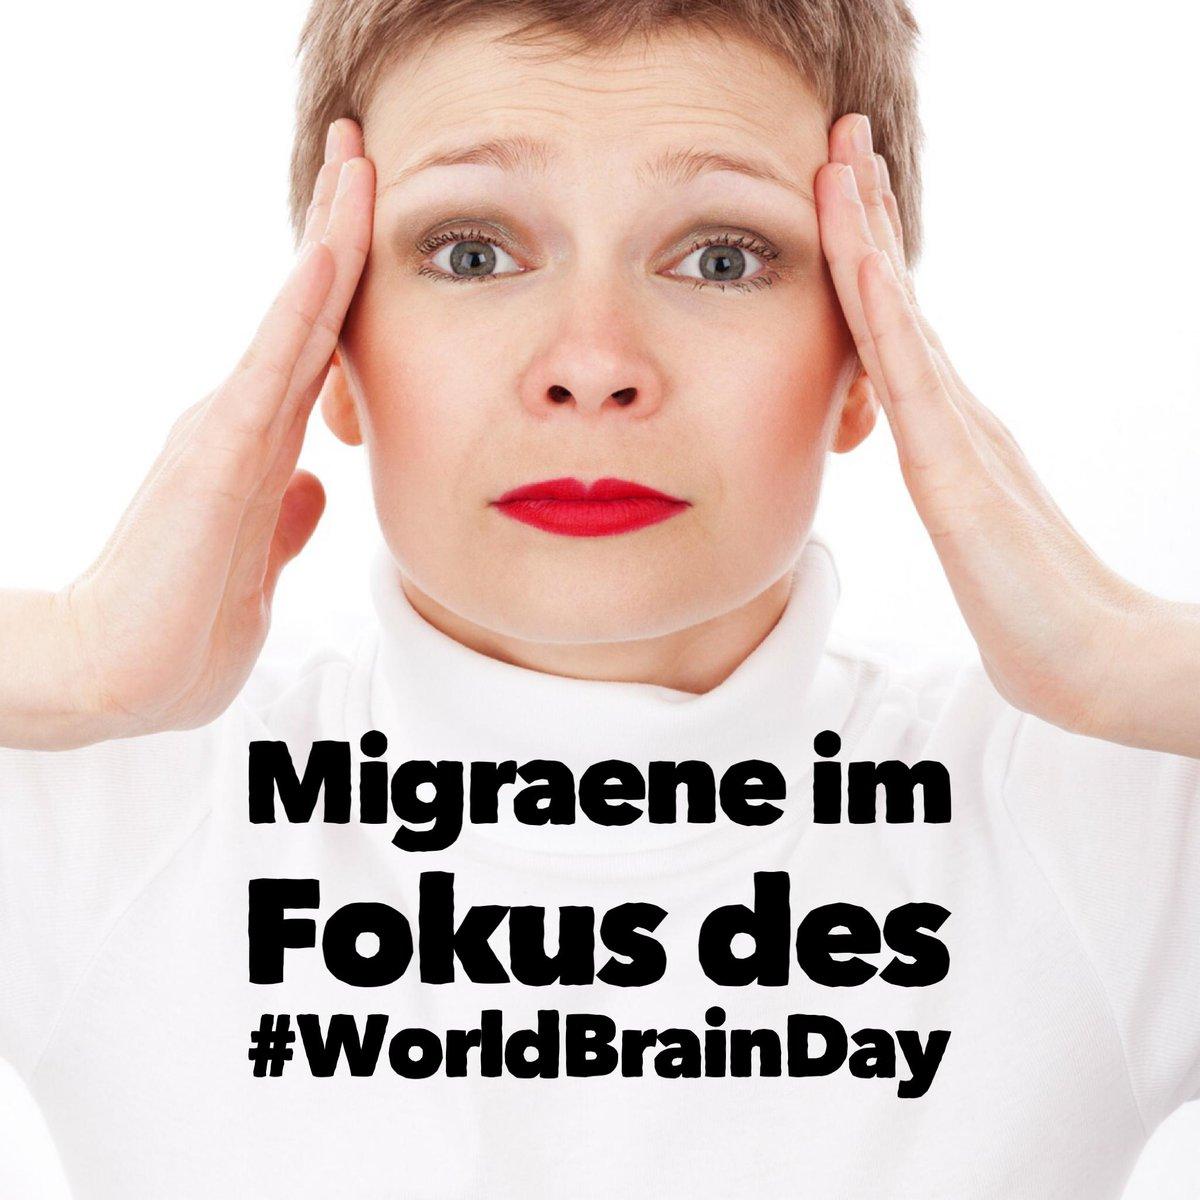 #Migräne im Fokus des #WorldBrainDay am 22. Juli 2019 Details https://t1p.de/lmpn via @dgneurologie #DMKG  http://www.attacke-kopfschmerzen.de/  #NotJustAMood #HowIFightDepression #ZentrumGL #Psychotherapie #Depression #IPT #DGIPT #Psychiatrie #Stress #BurnOut #Counseling #ZPGW